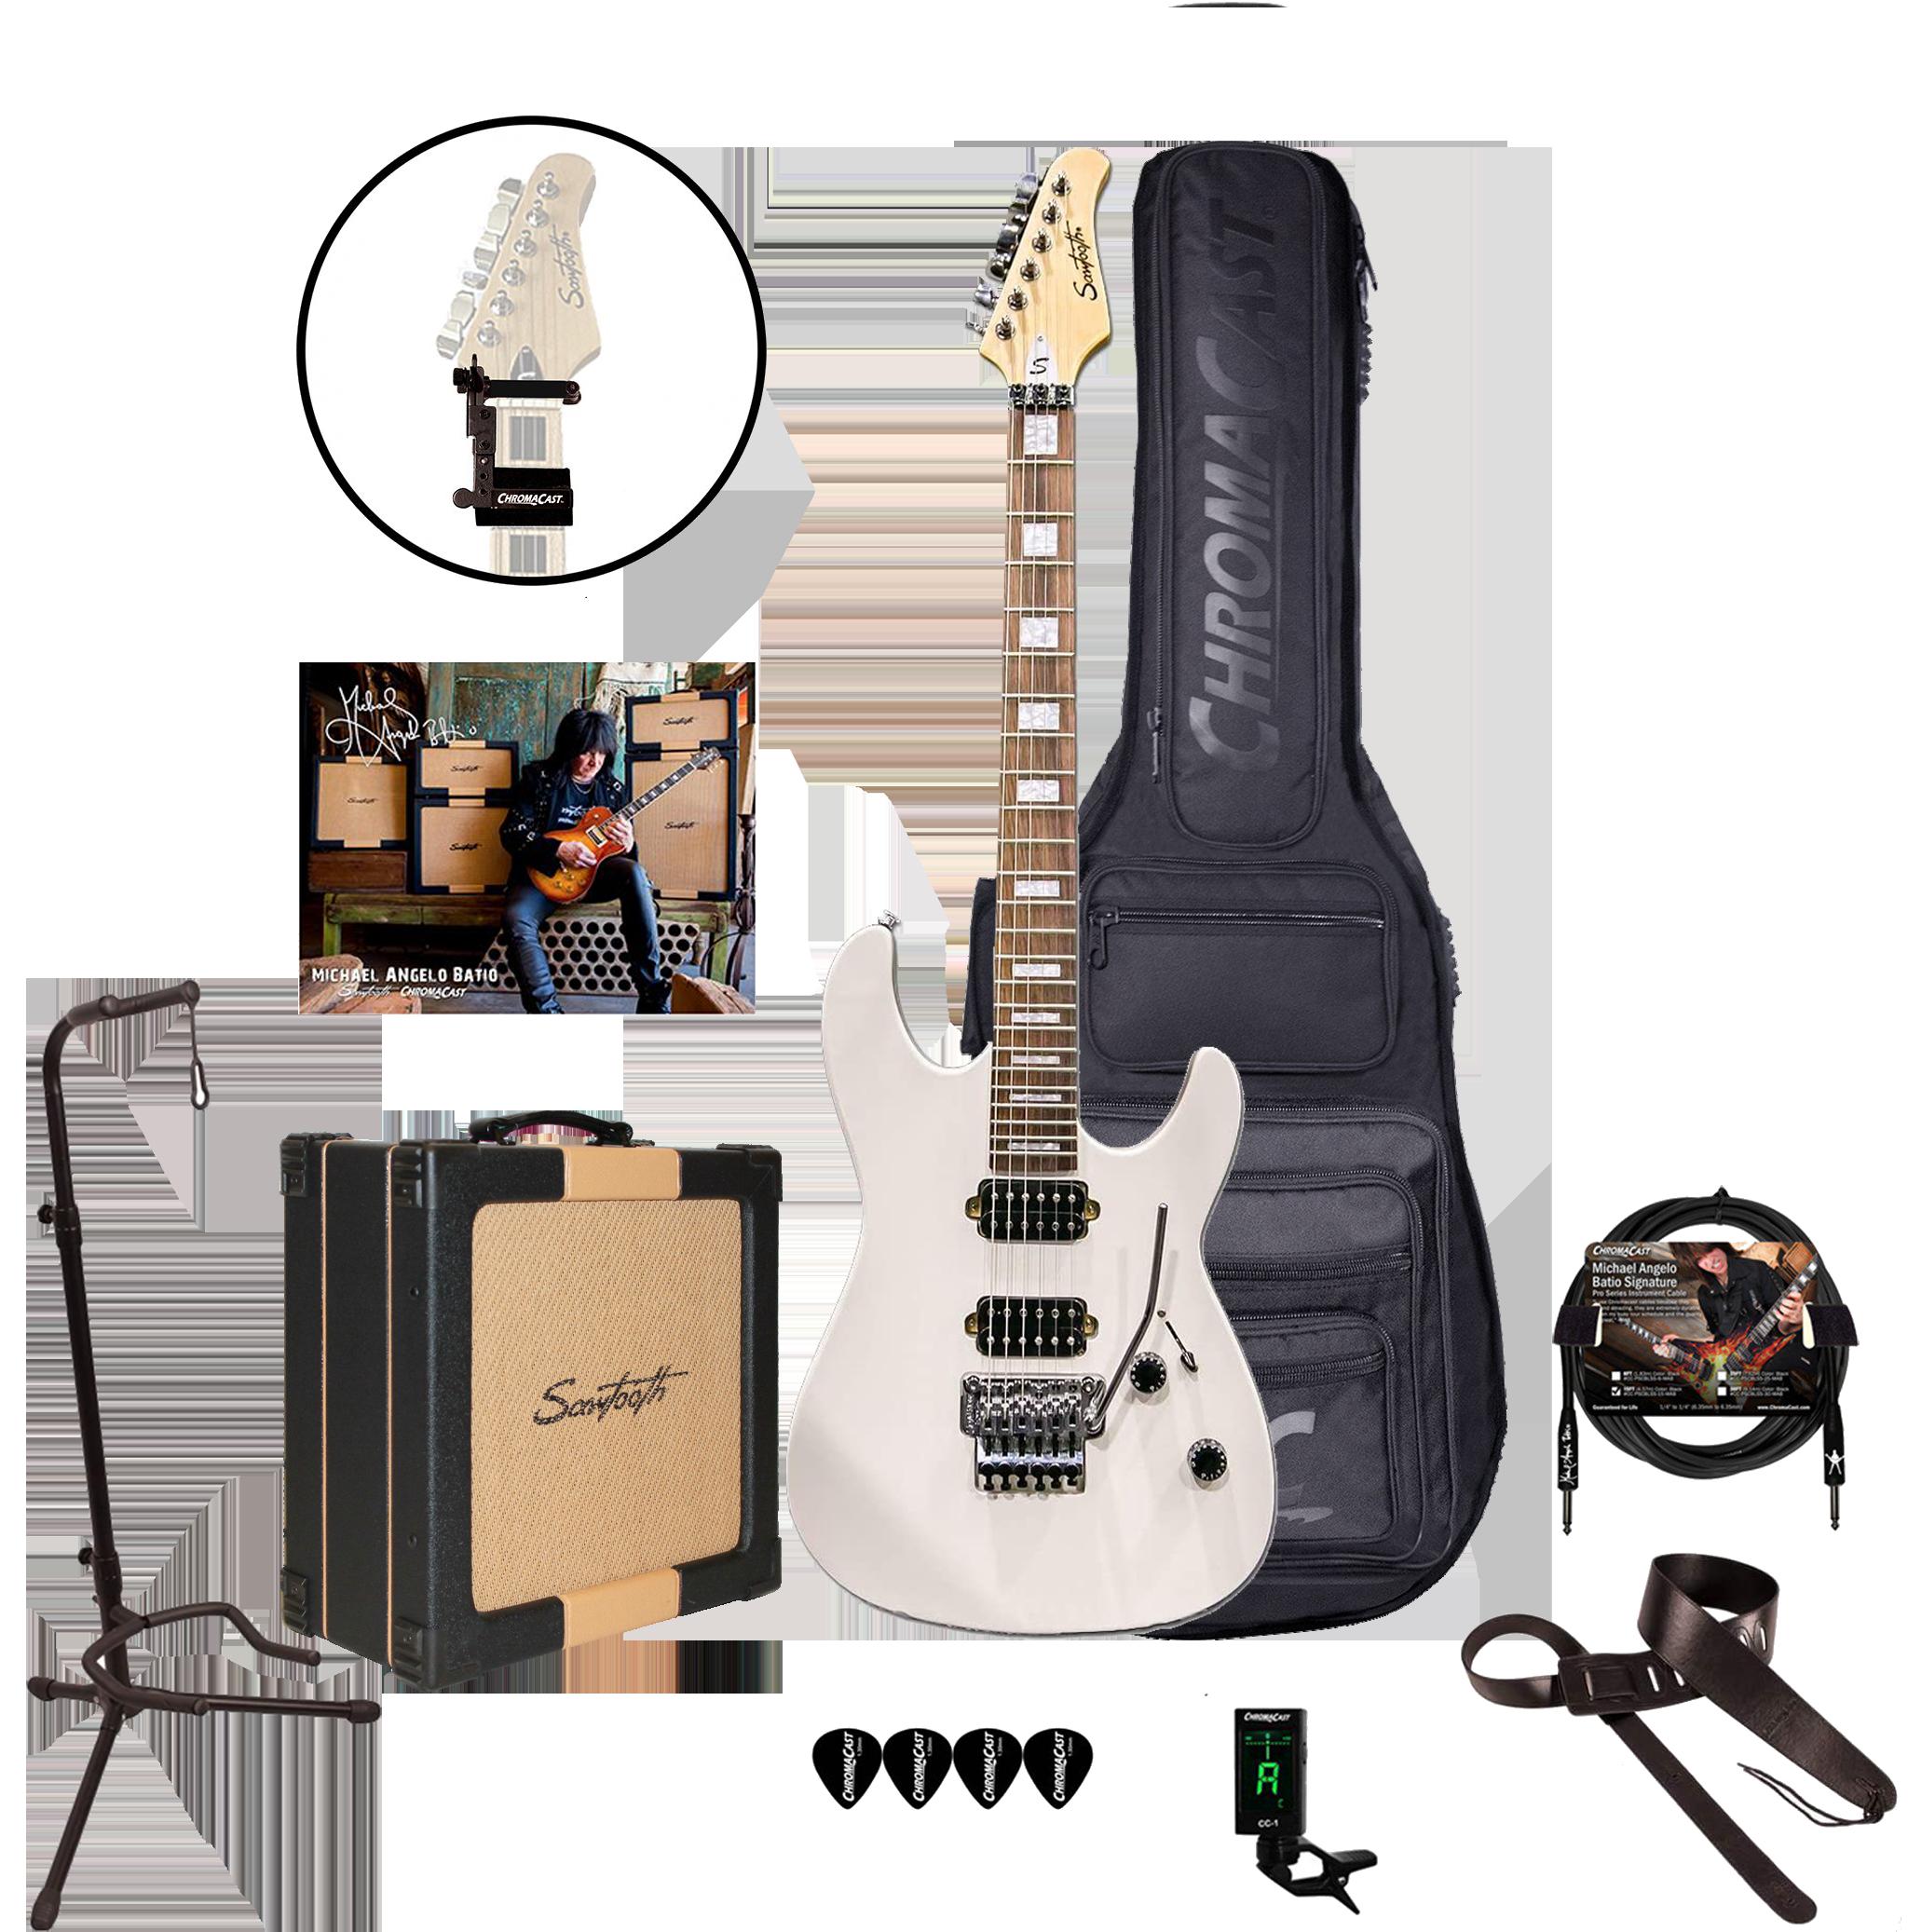 Sawtooth ST-M24 Satin White Floyd Rose, MAB Signature 24 Fret Electric Guitar Pack